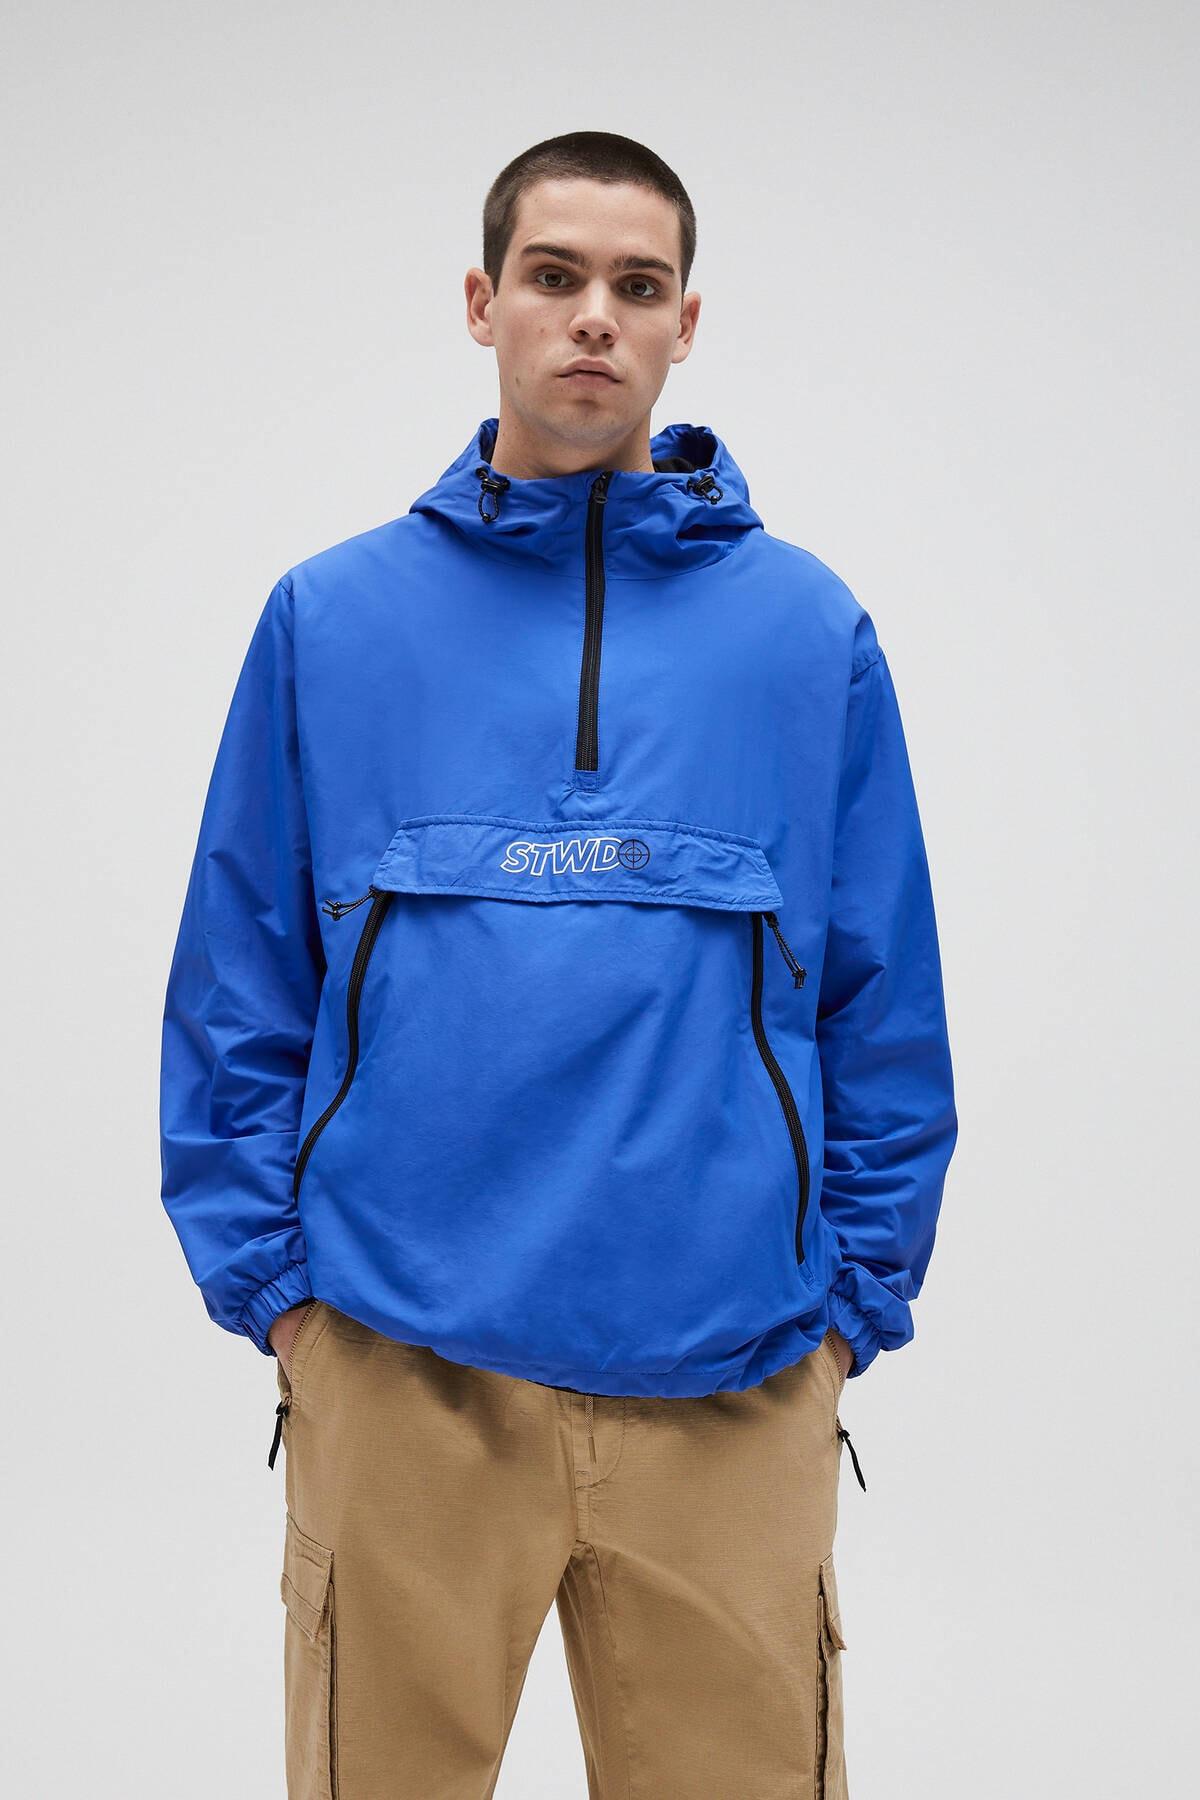 Pull & Bear Erkek Yoğun Mavi Basic Stwd Logolu Kanguru Mont 04711541 0